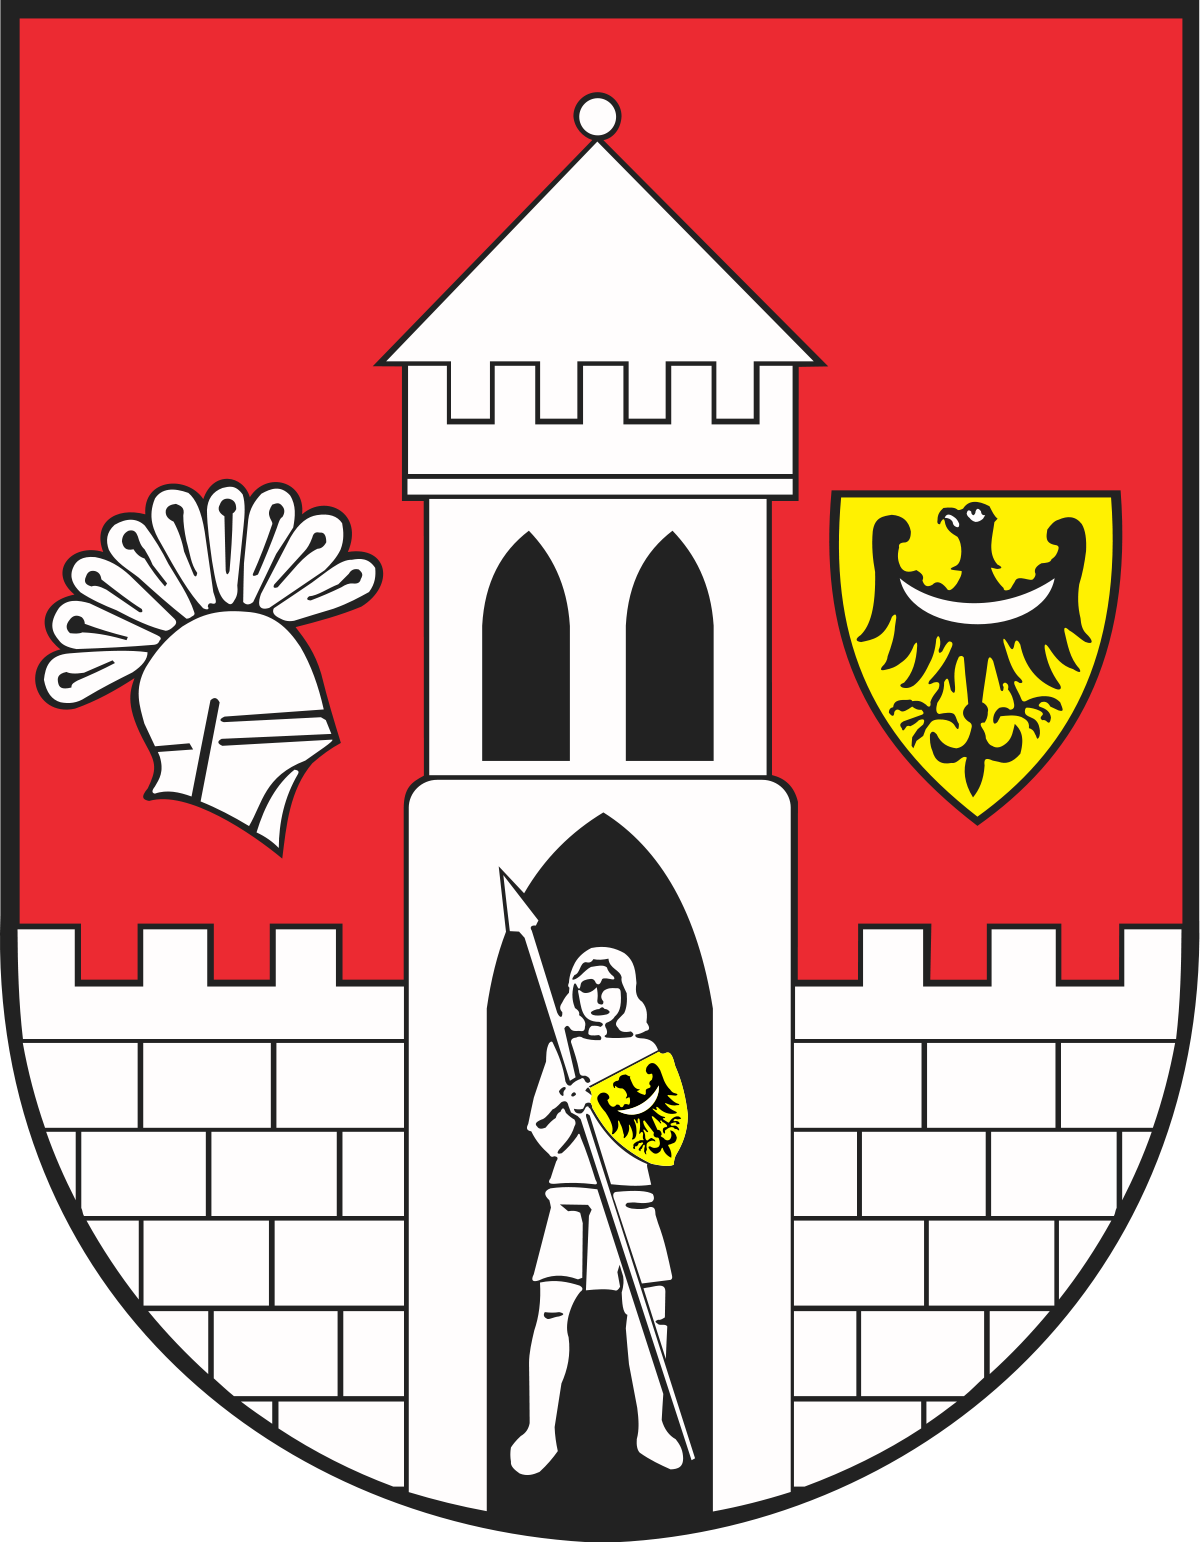 Urząd Miasta Żagań